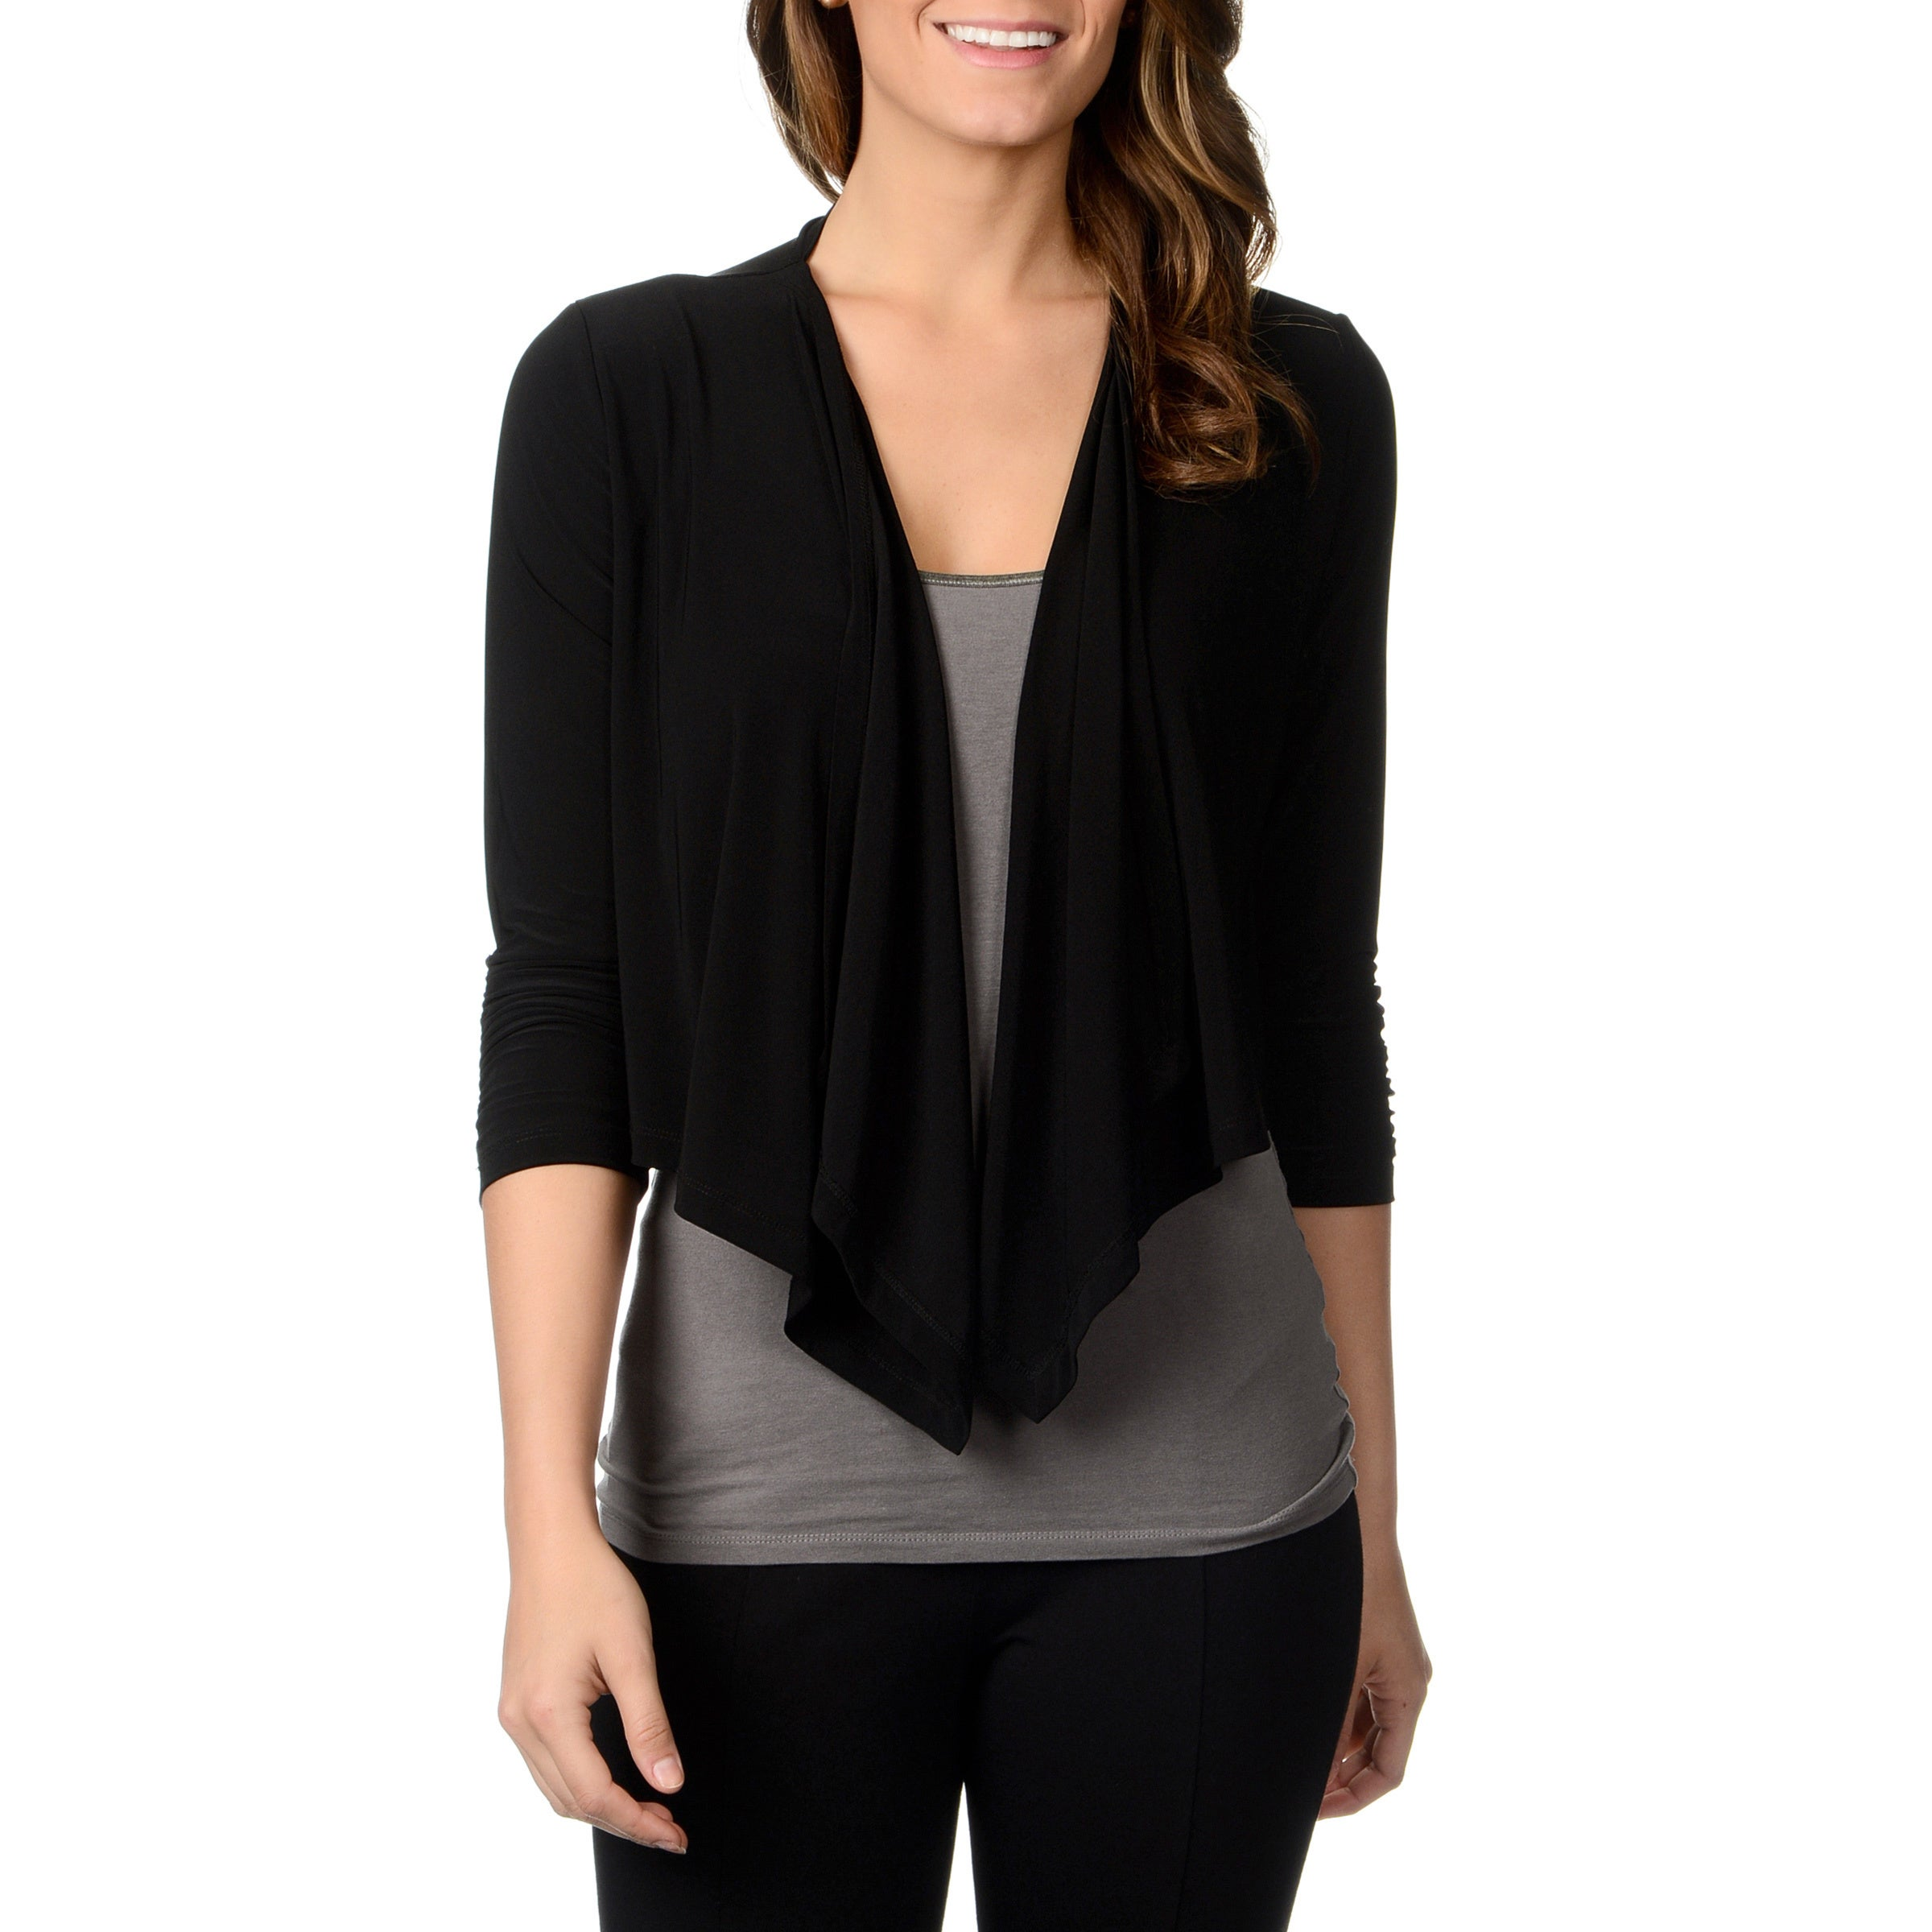 Lennie For Nina Leonard Womens Black Jersey knit Shrug